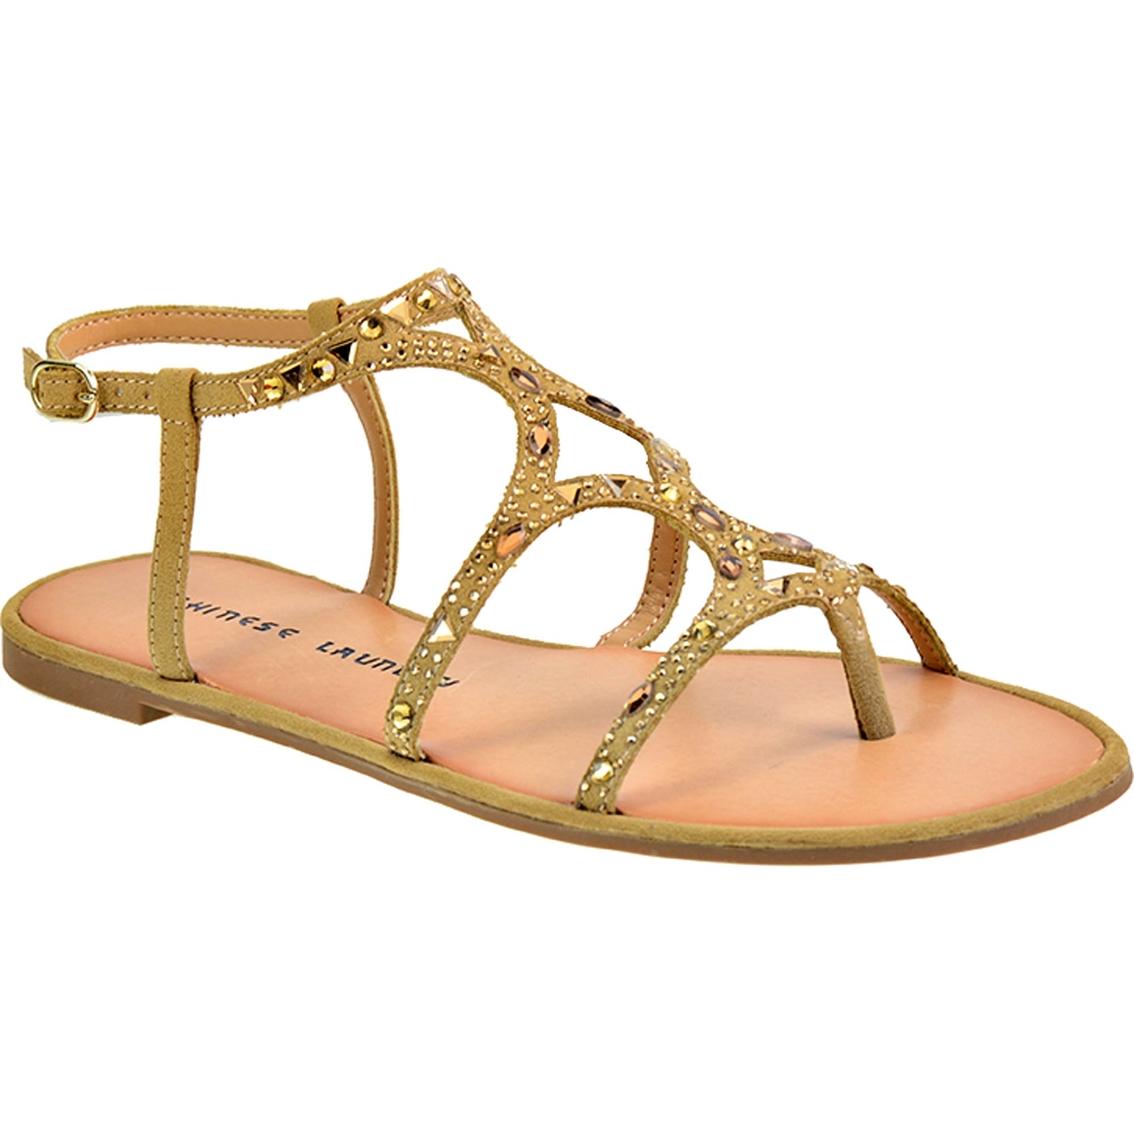 1d6e0b3f0 Chinese Laundry Genevieve Rhinestone Flat Sandals